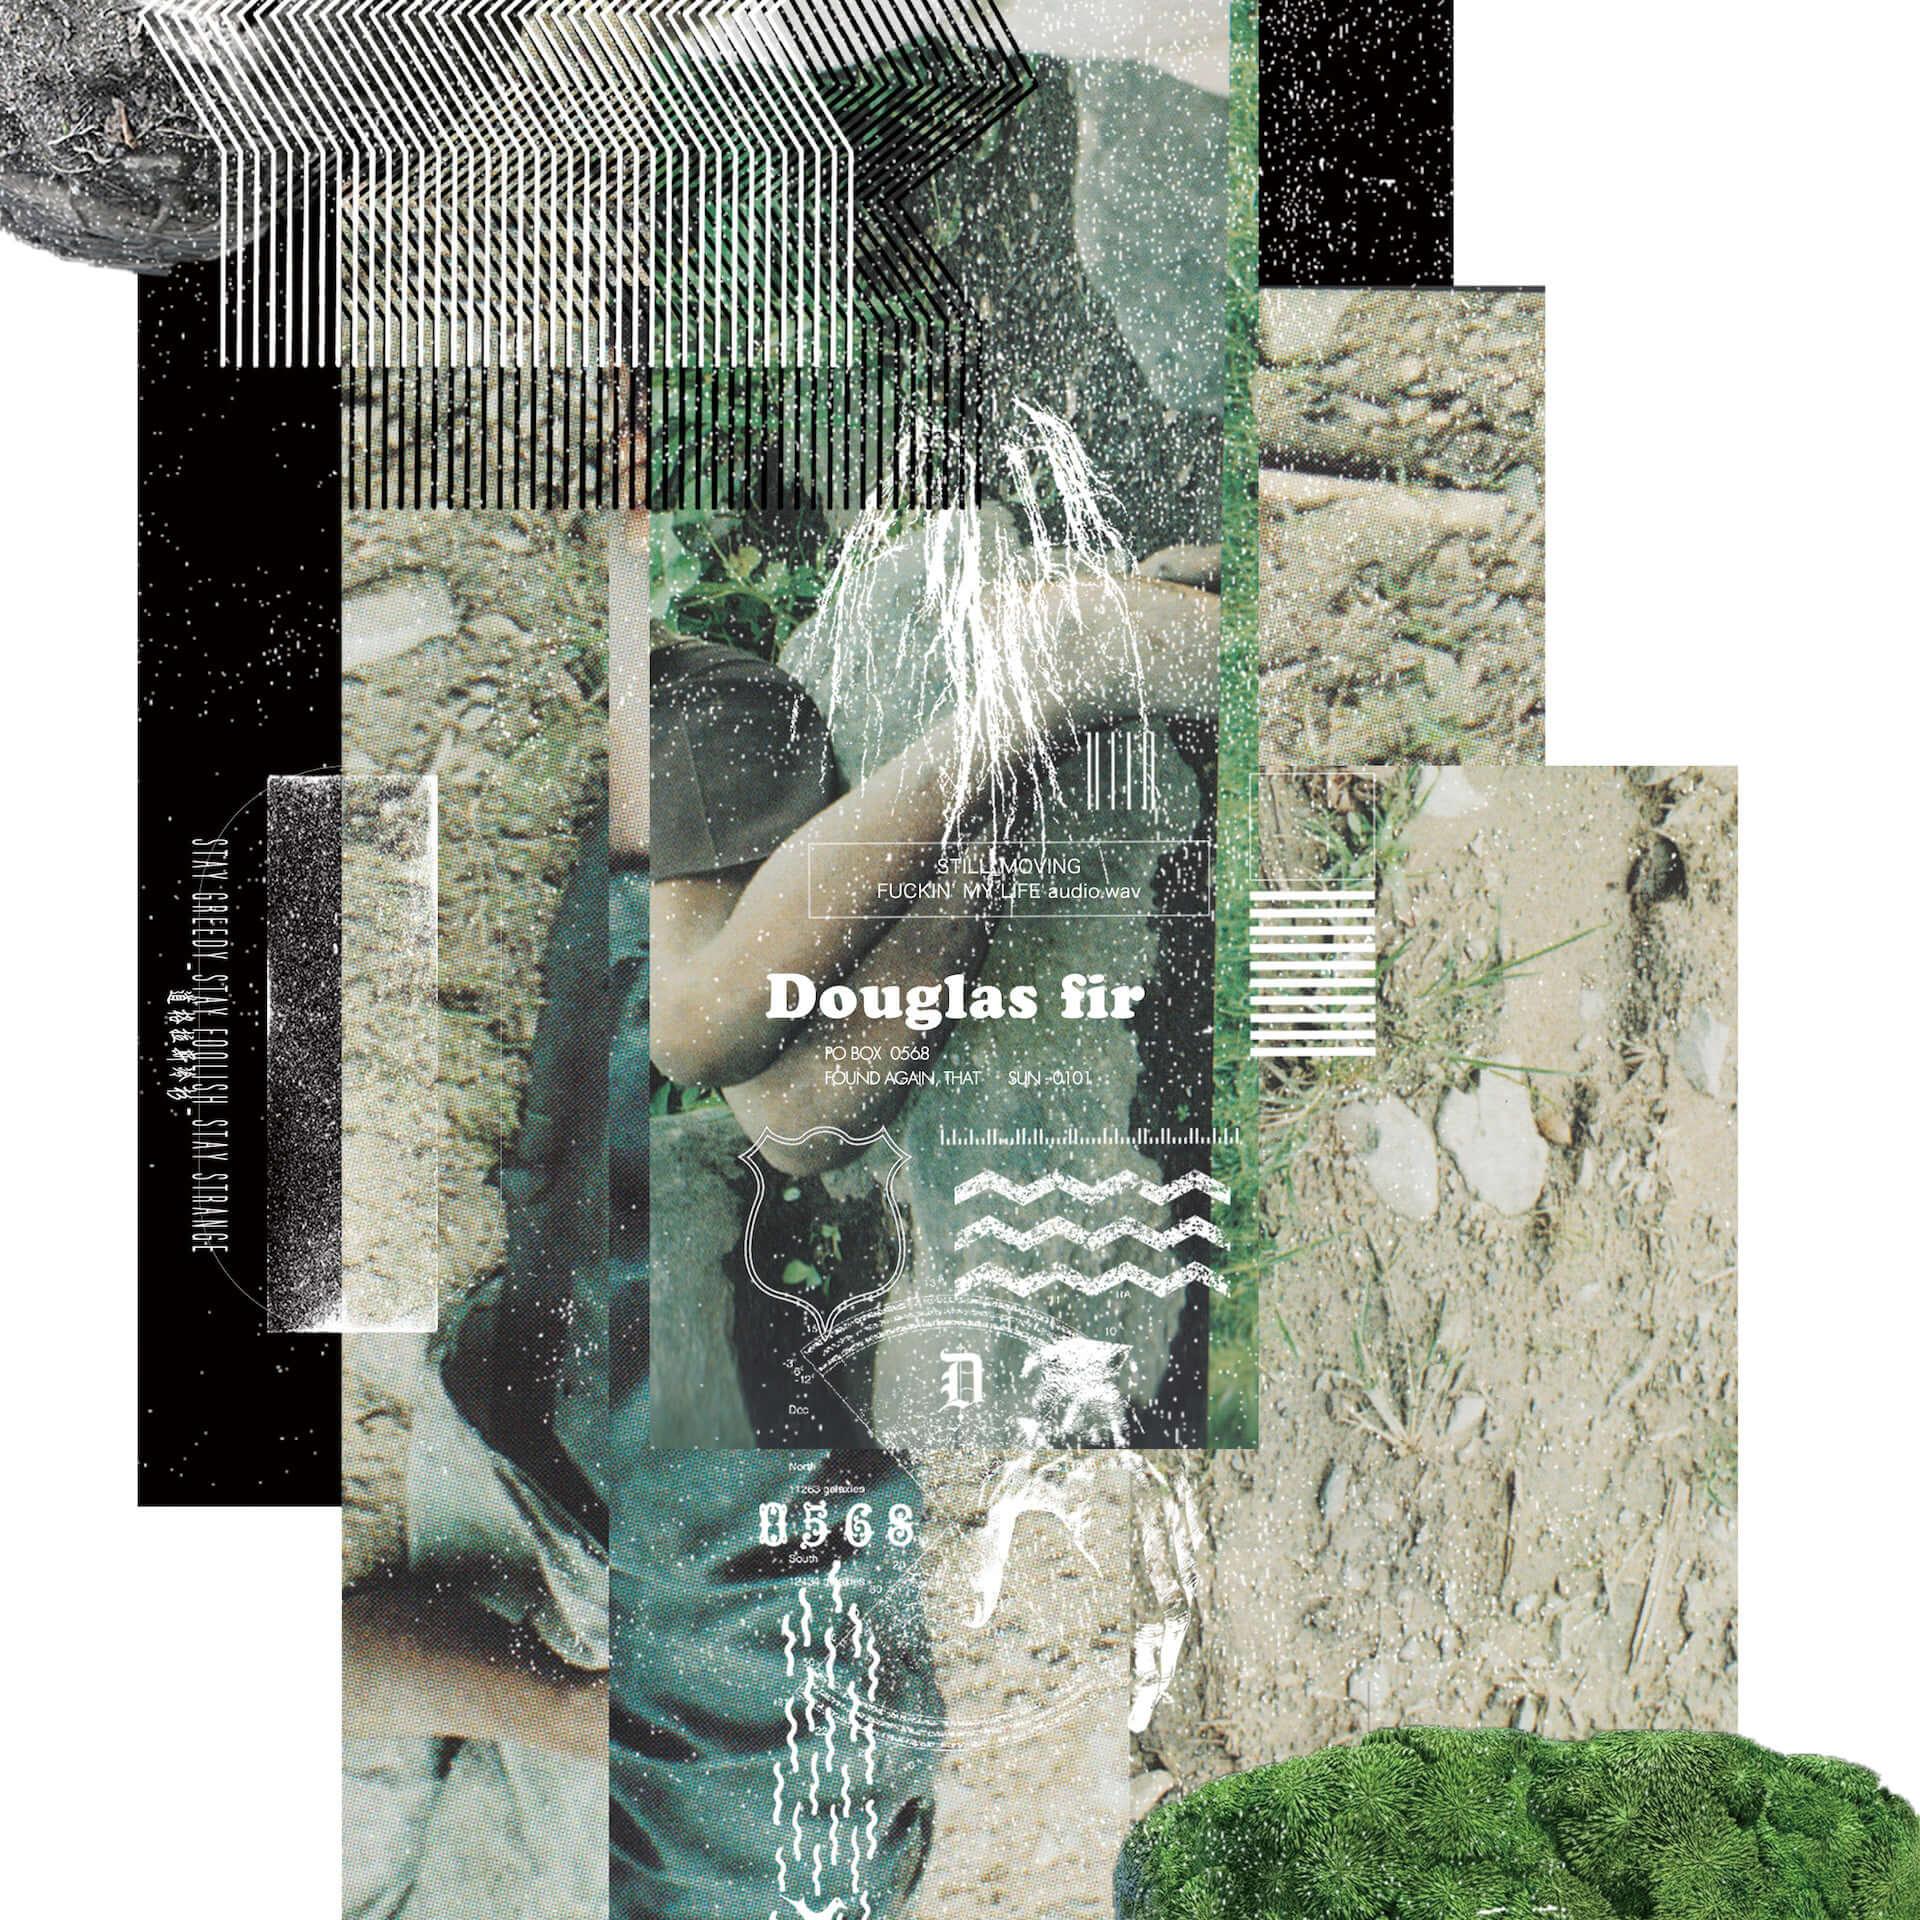 Campanella、坂本龍一の楽曲をサンプリングした新曲「Douglas fir」をリリース|プロデュースにRamza music190911_campanella_1-1920x1920